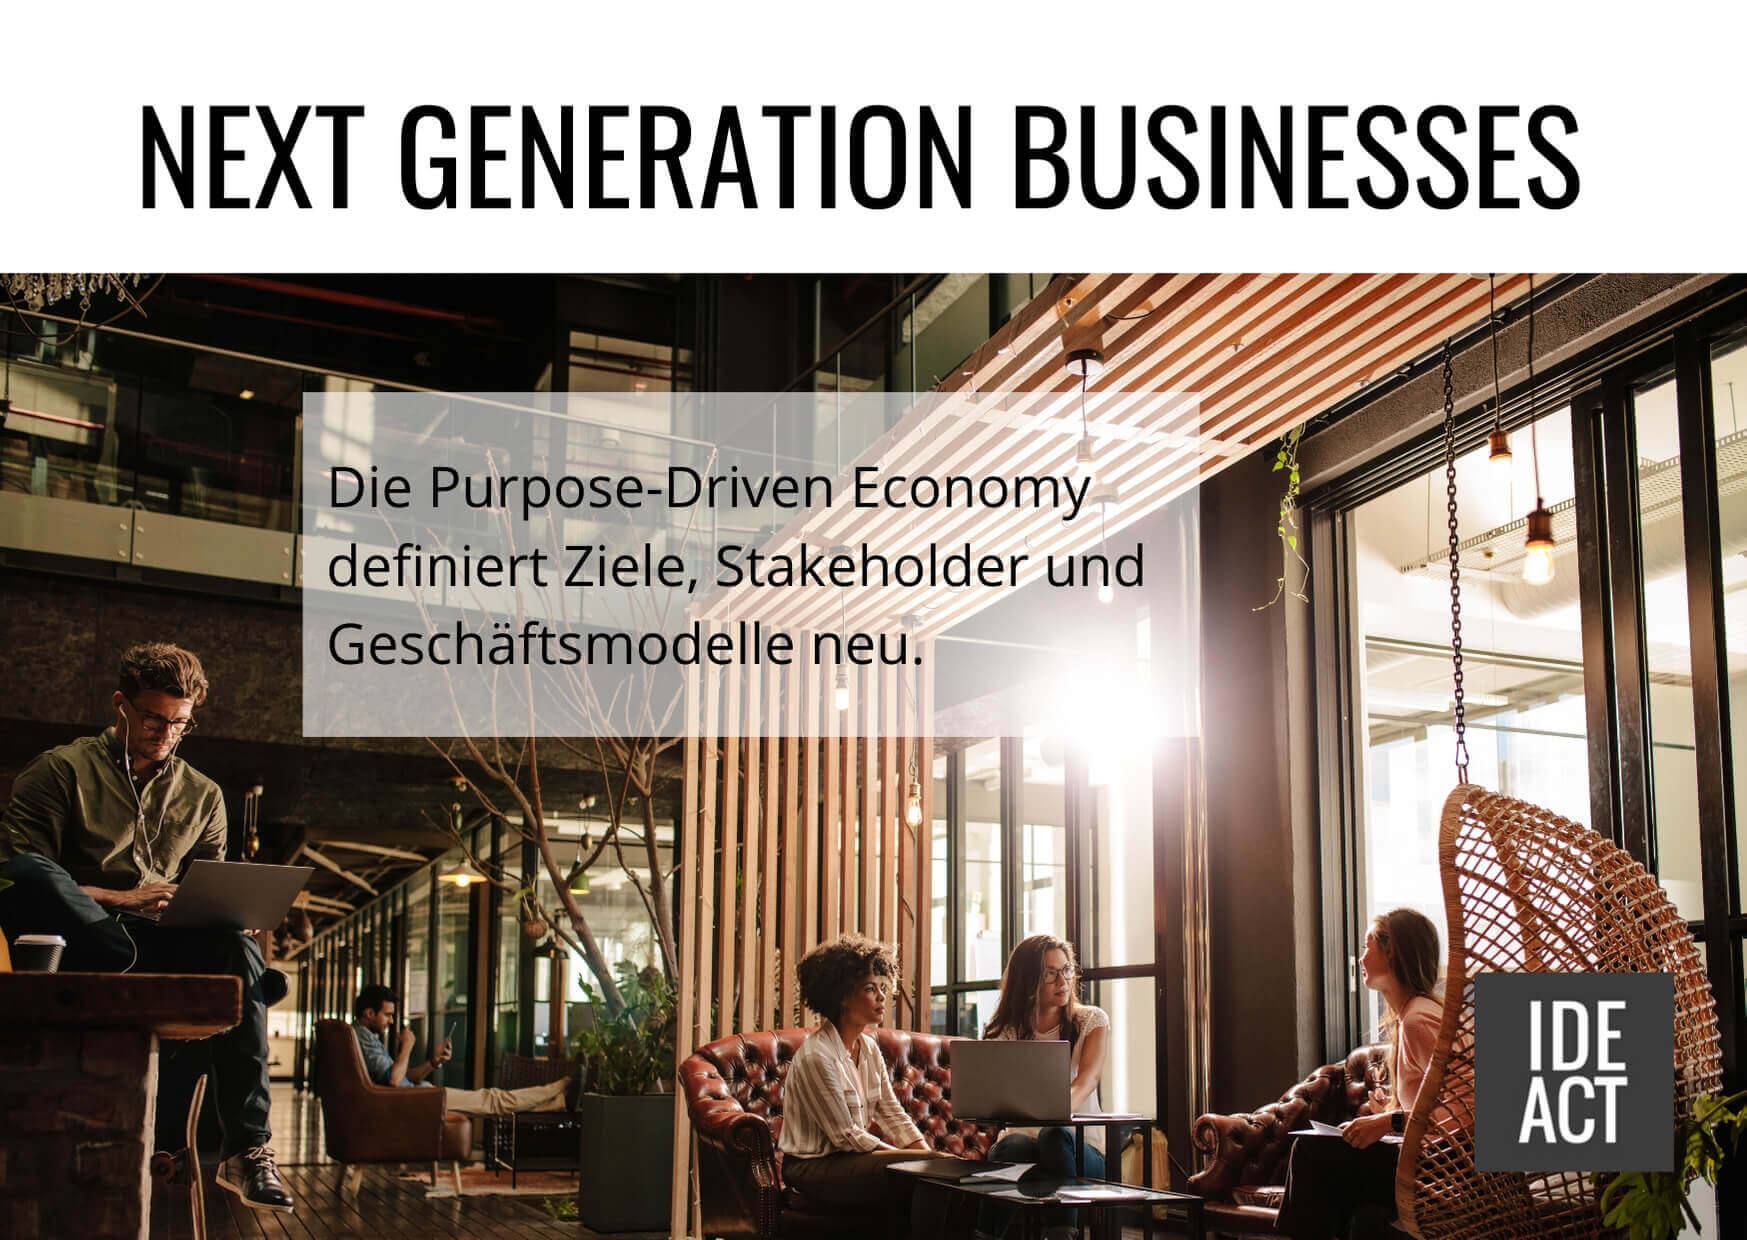 Next generation businesses